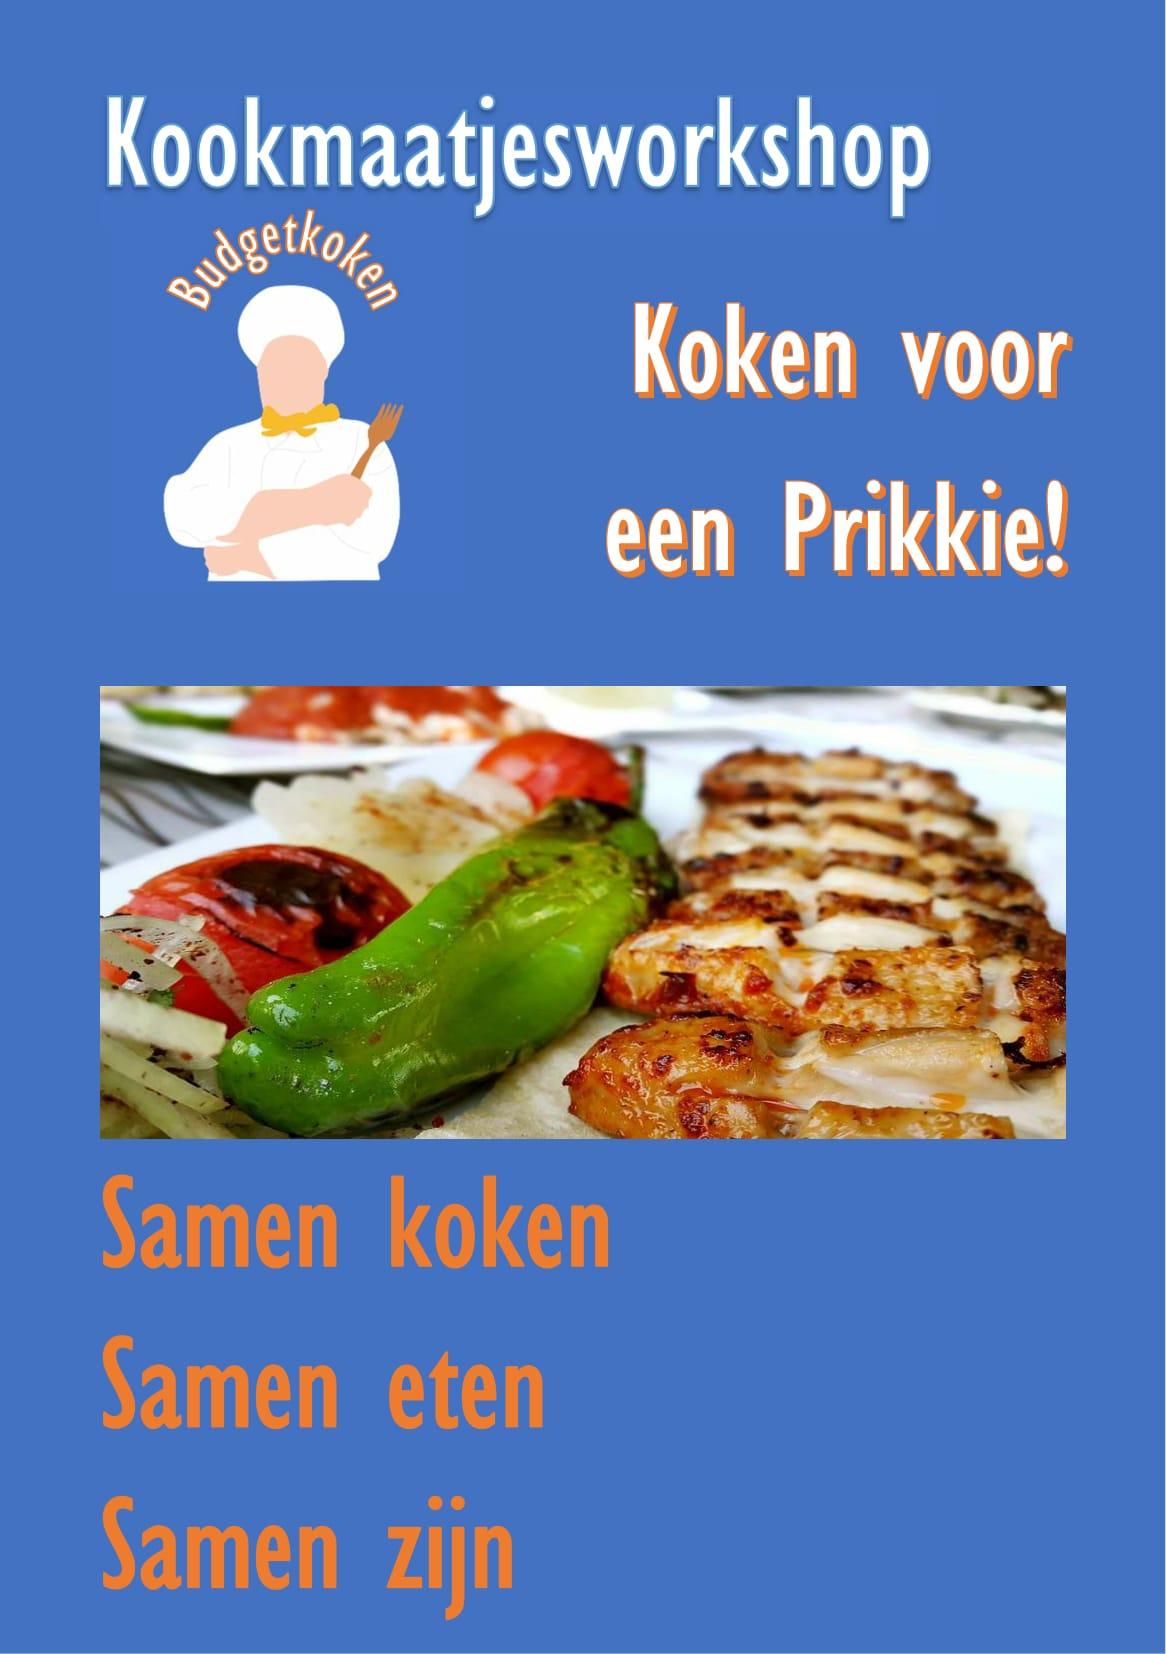 Kookmaatjesworkshop @ Oosterkerk | Haarlem | Noord-Holland | Nederland